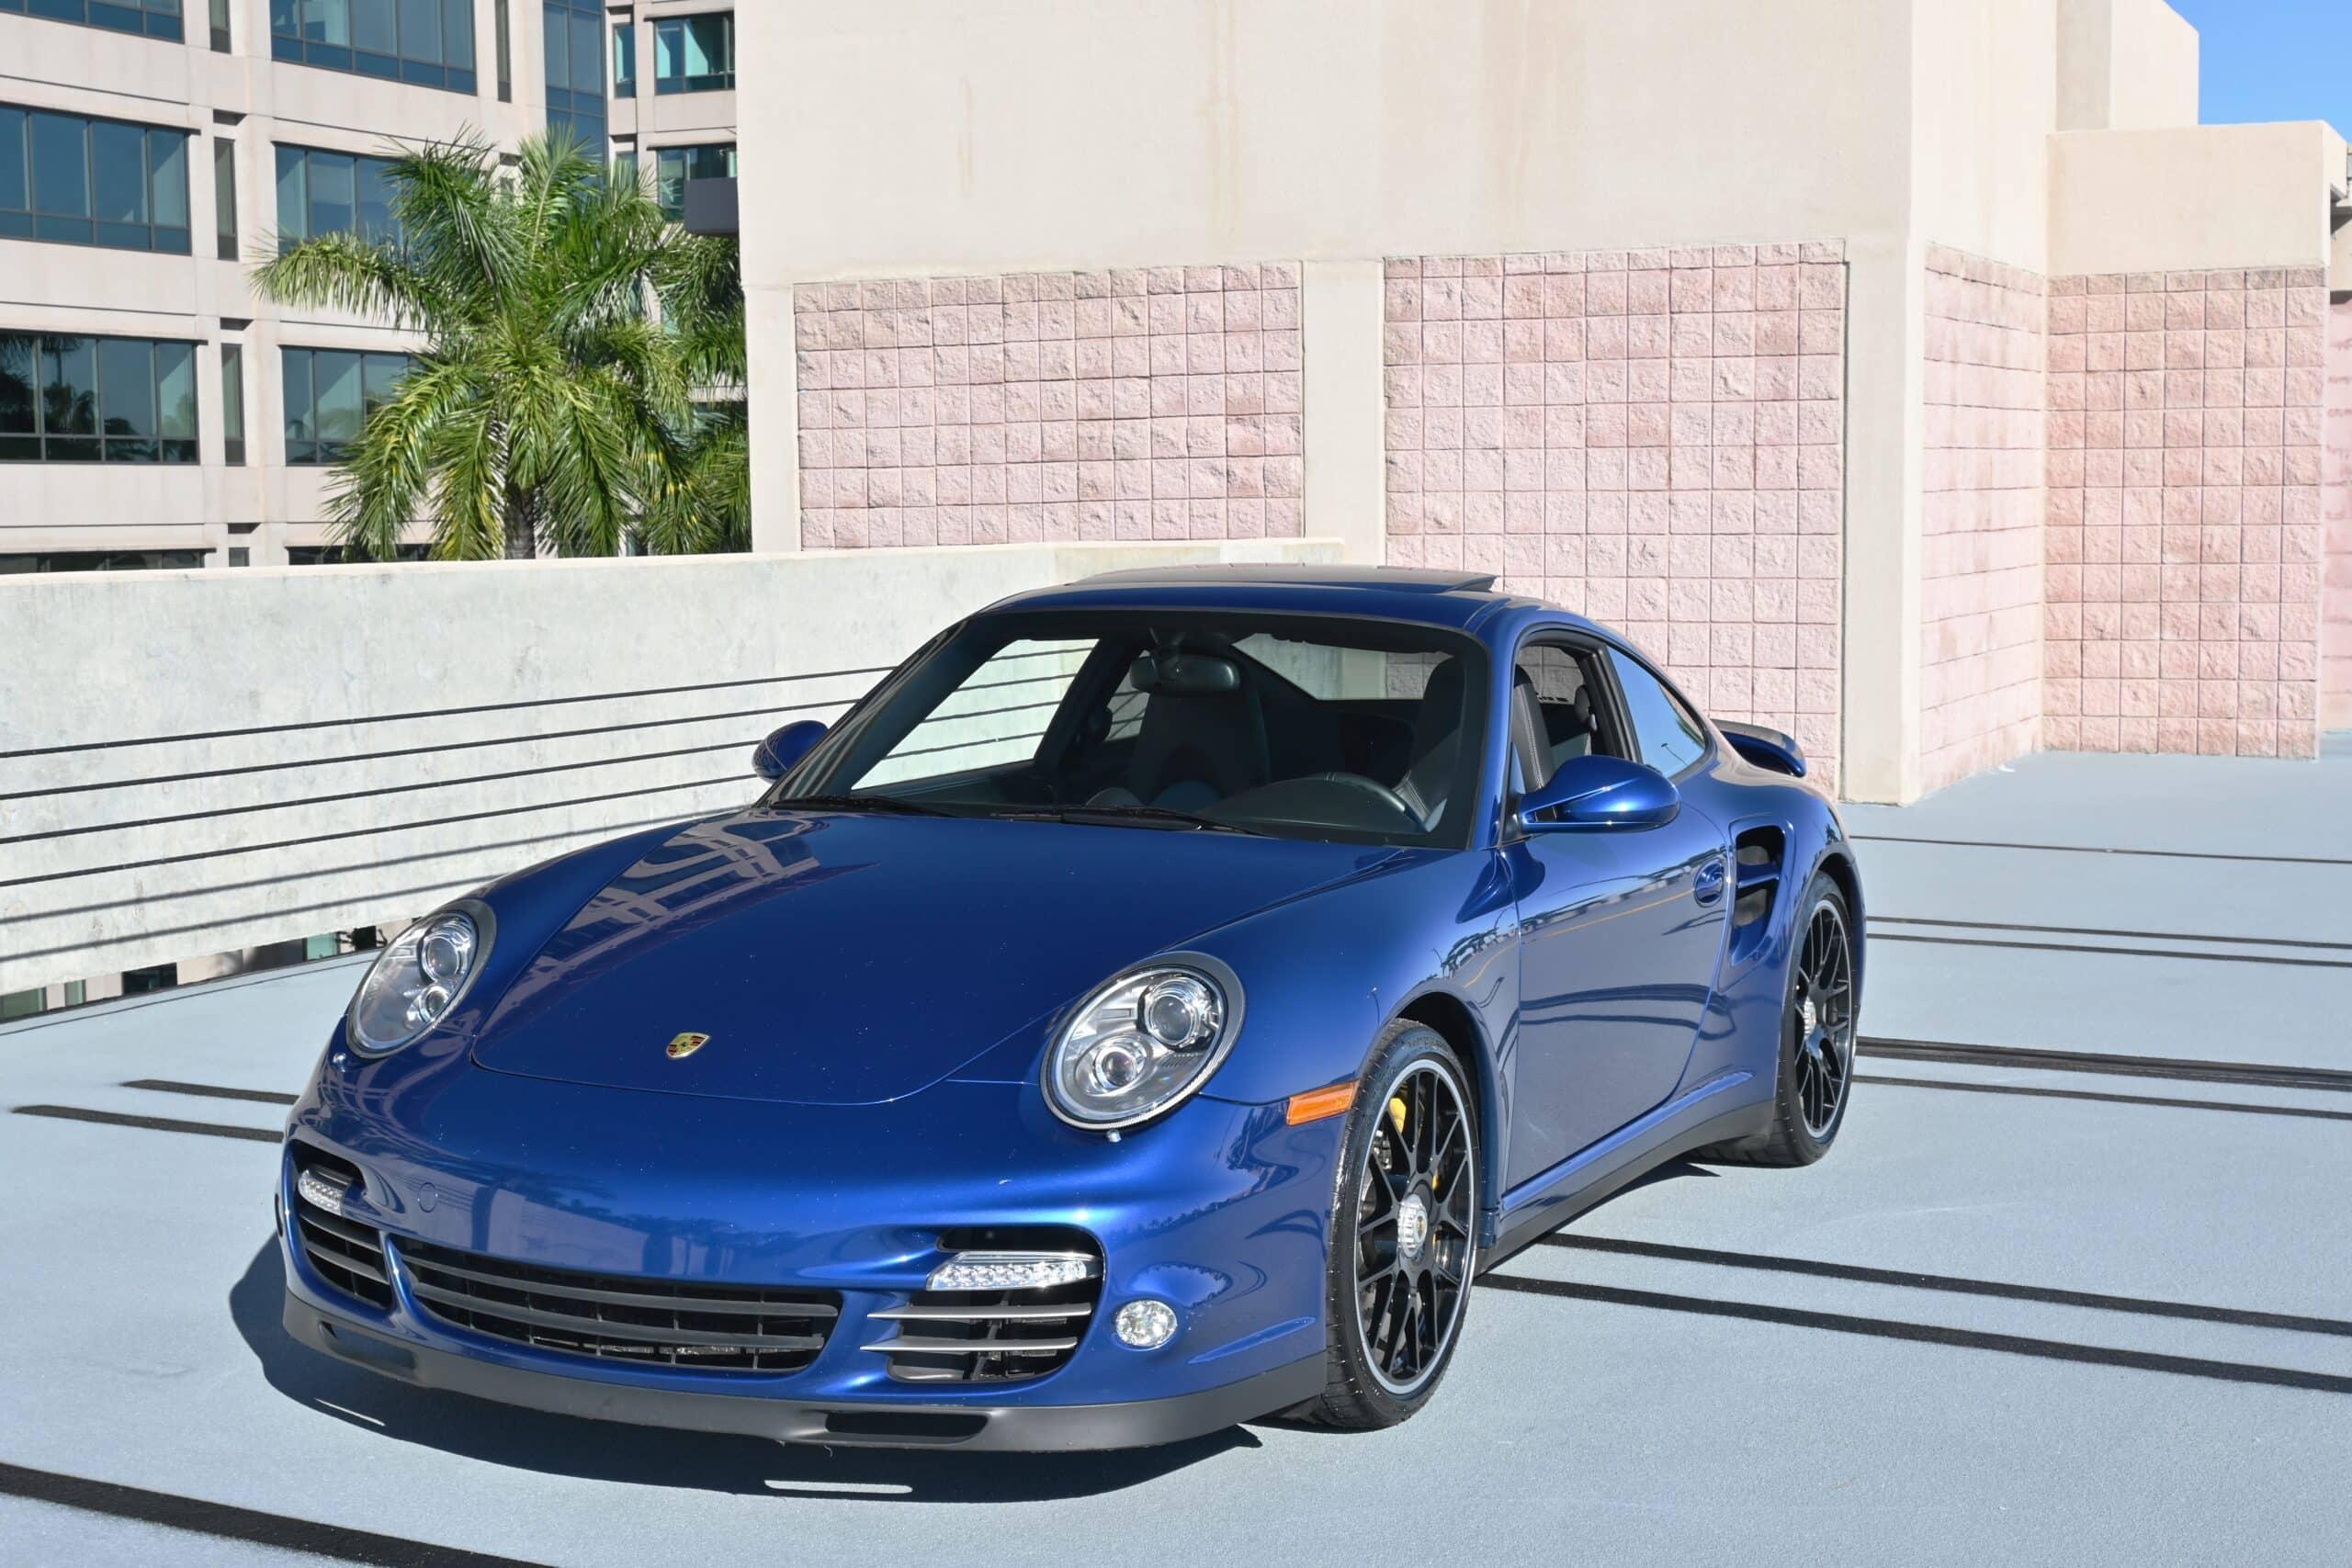 2012 Porsche 911 Turbo S 997.2 1 Owner-Original Aqua Blue Metallic-Sport Seats-Carbon Brakes-Original sticker